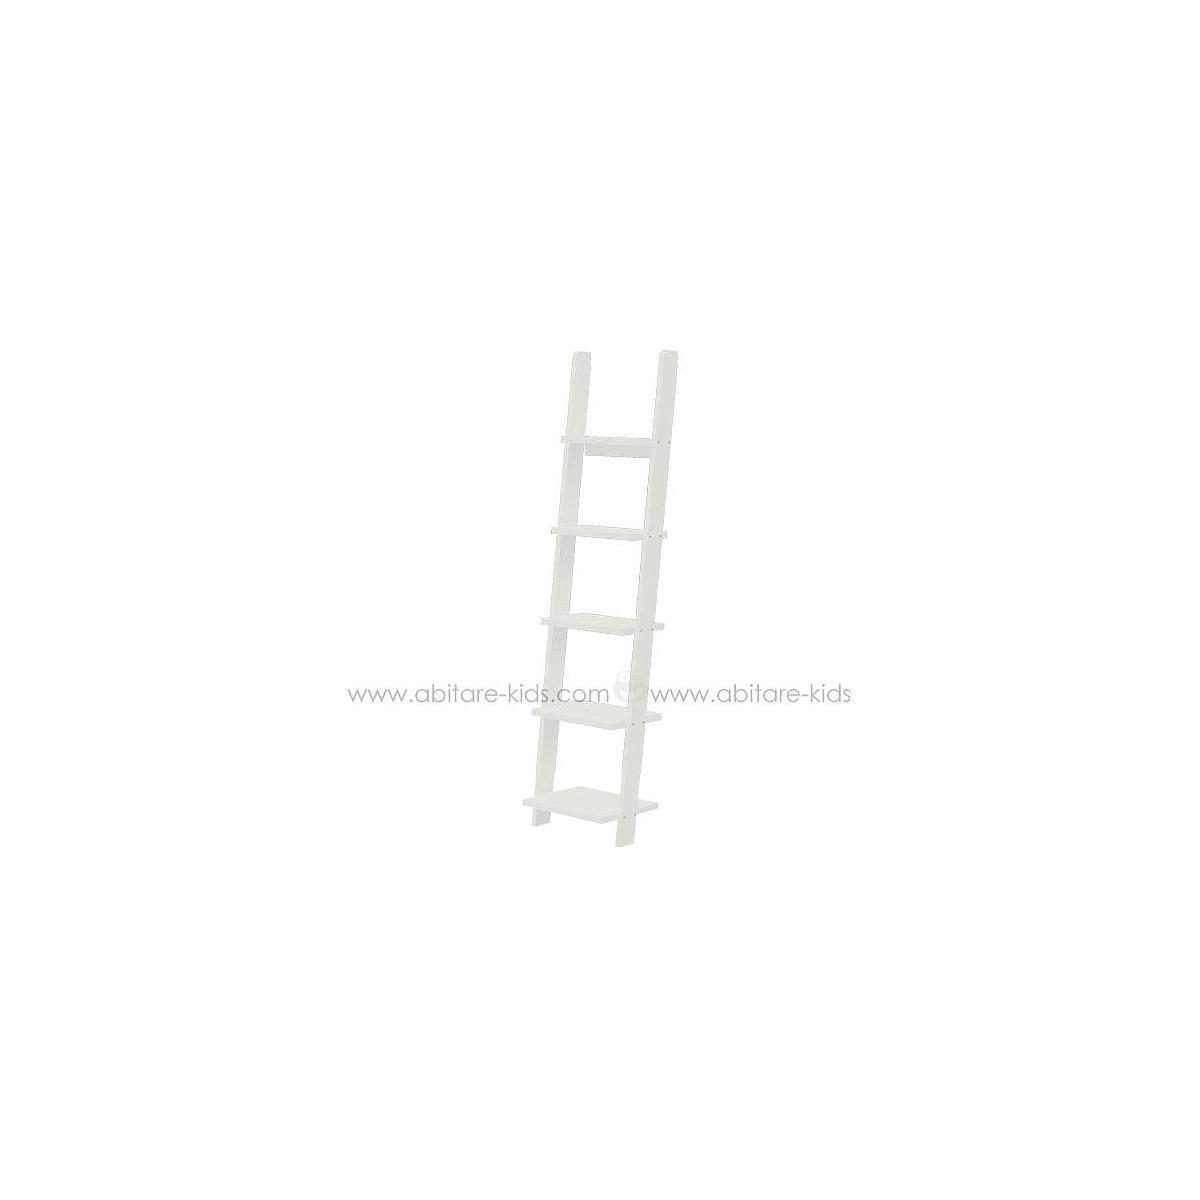 STRADA by Tenzo Bibliothèque Echelle étroite - Blanc